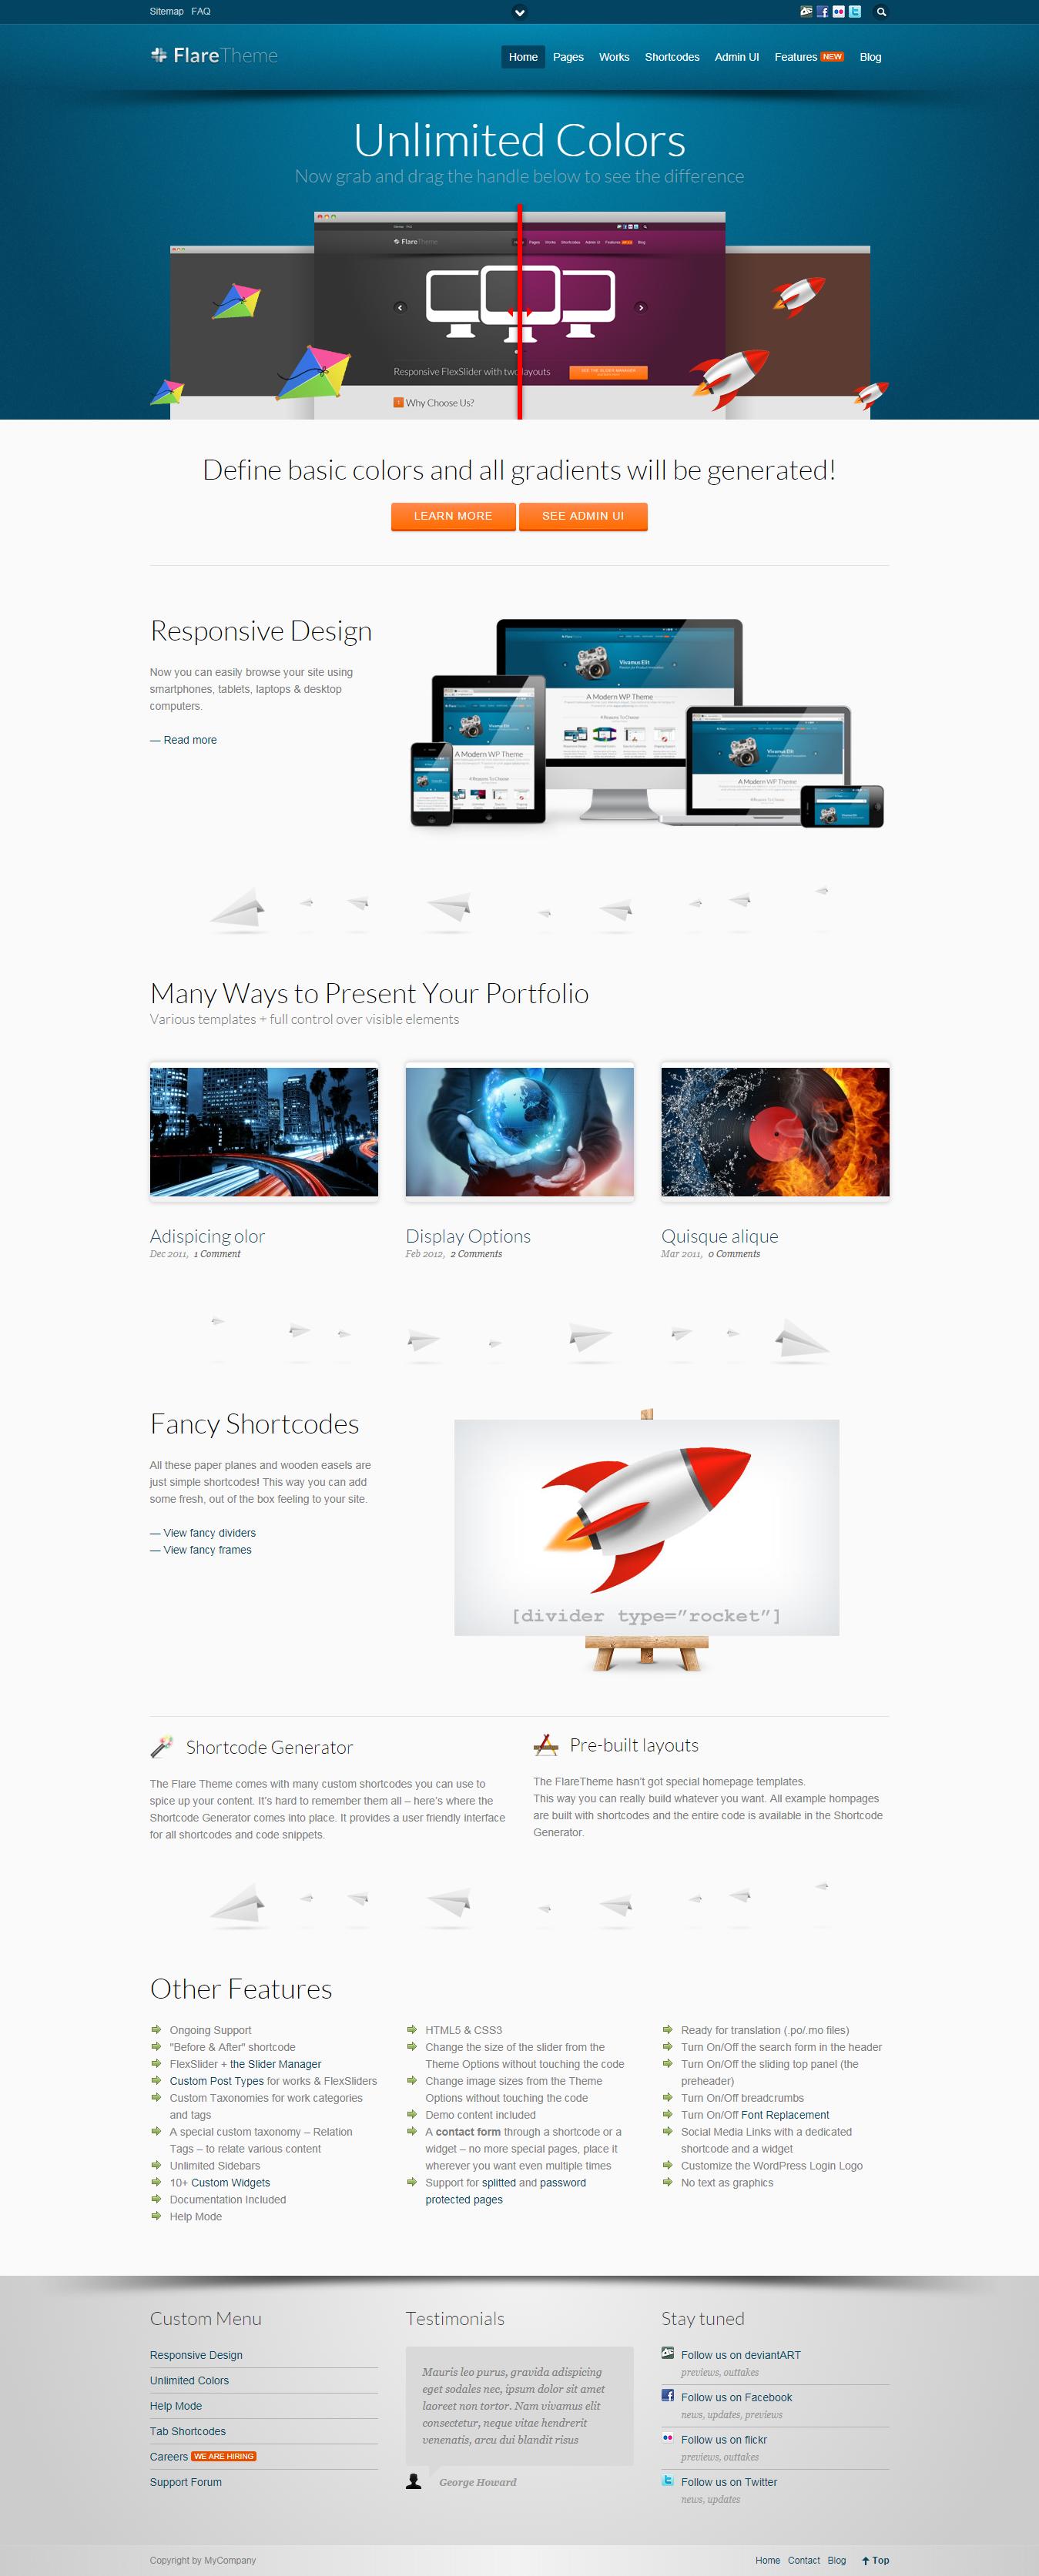 flare best premium science wordpress theme - 10+ Best Premium Science WordPress Themes